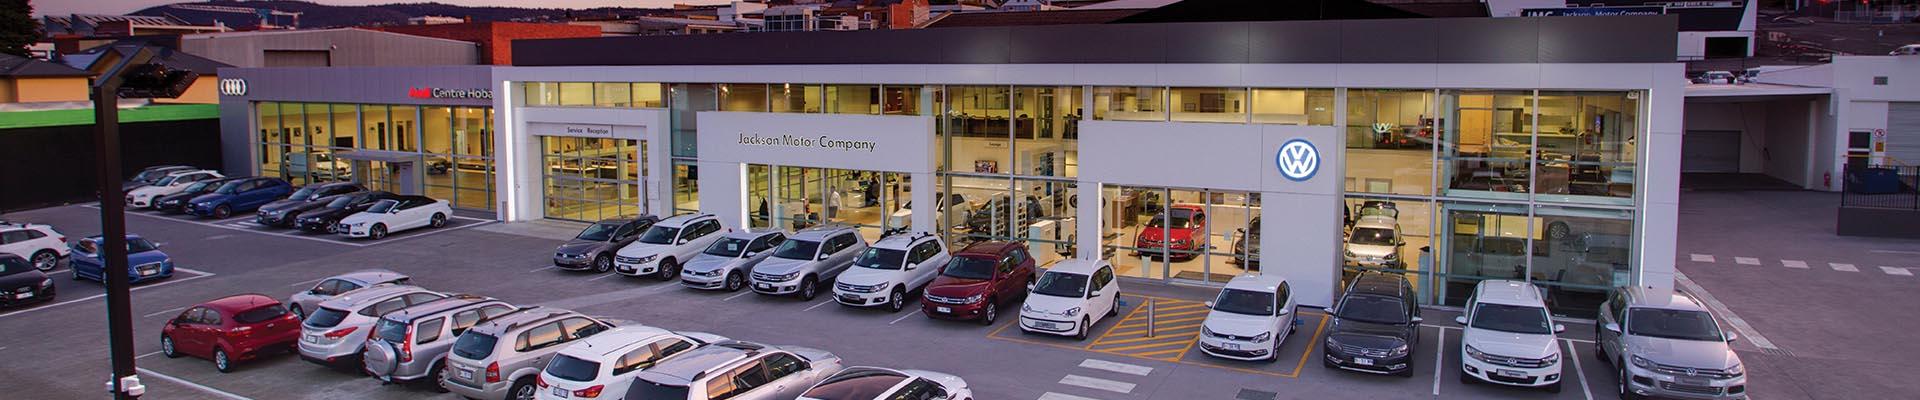 Jackson Motor Company-Hobart